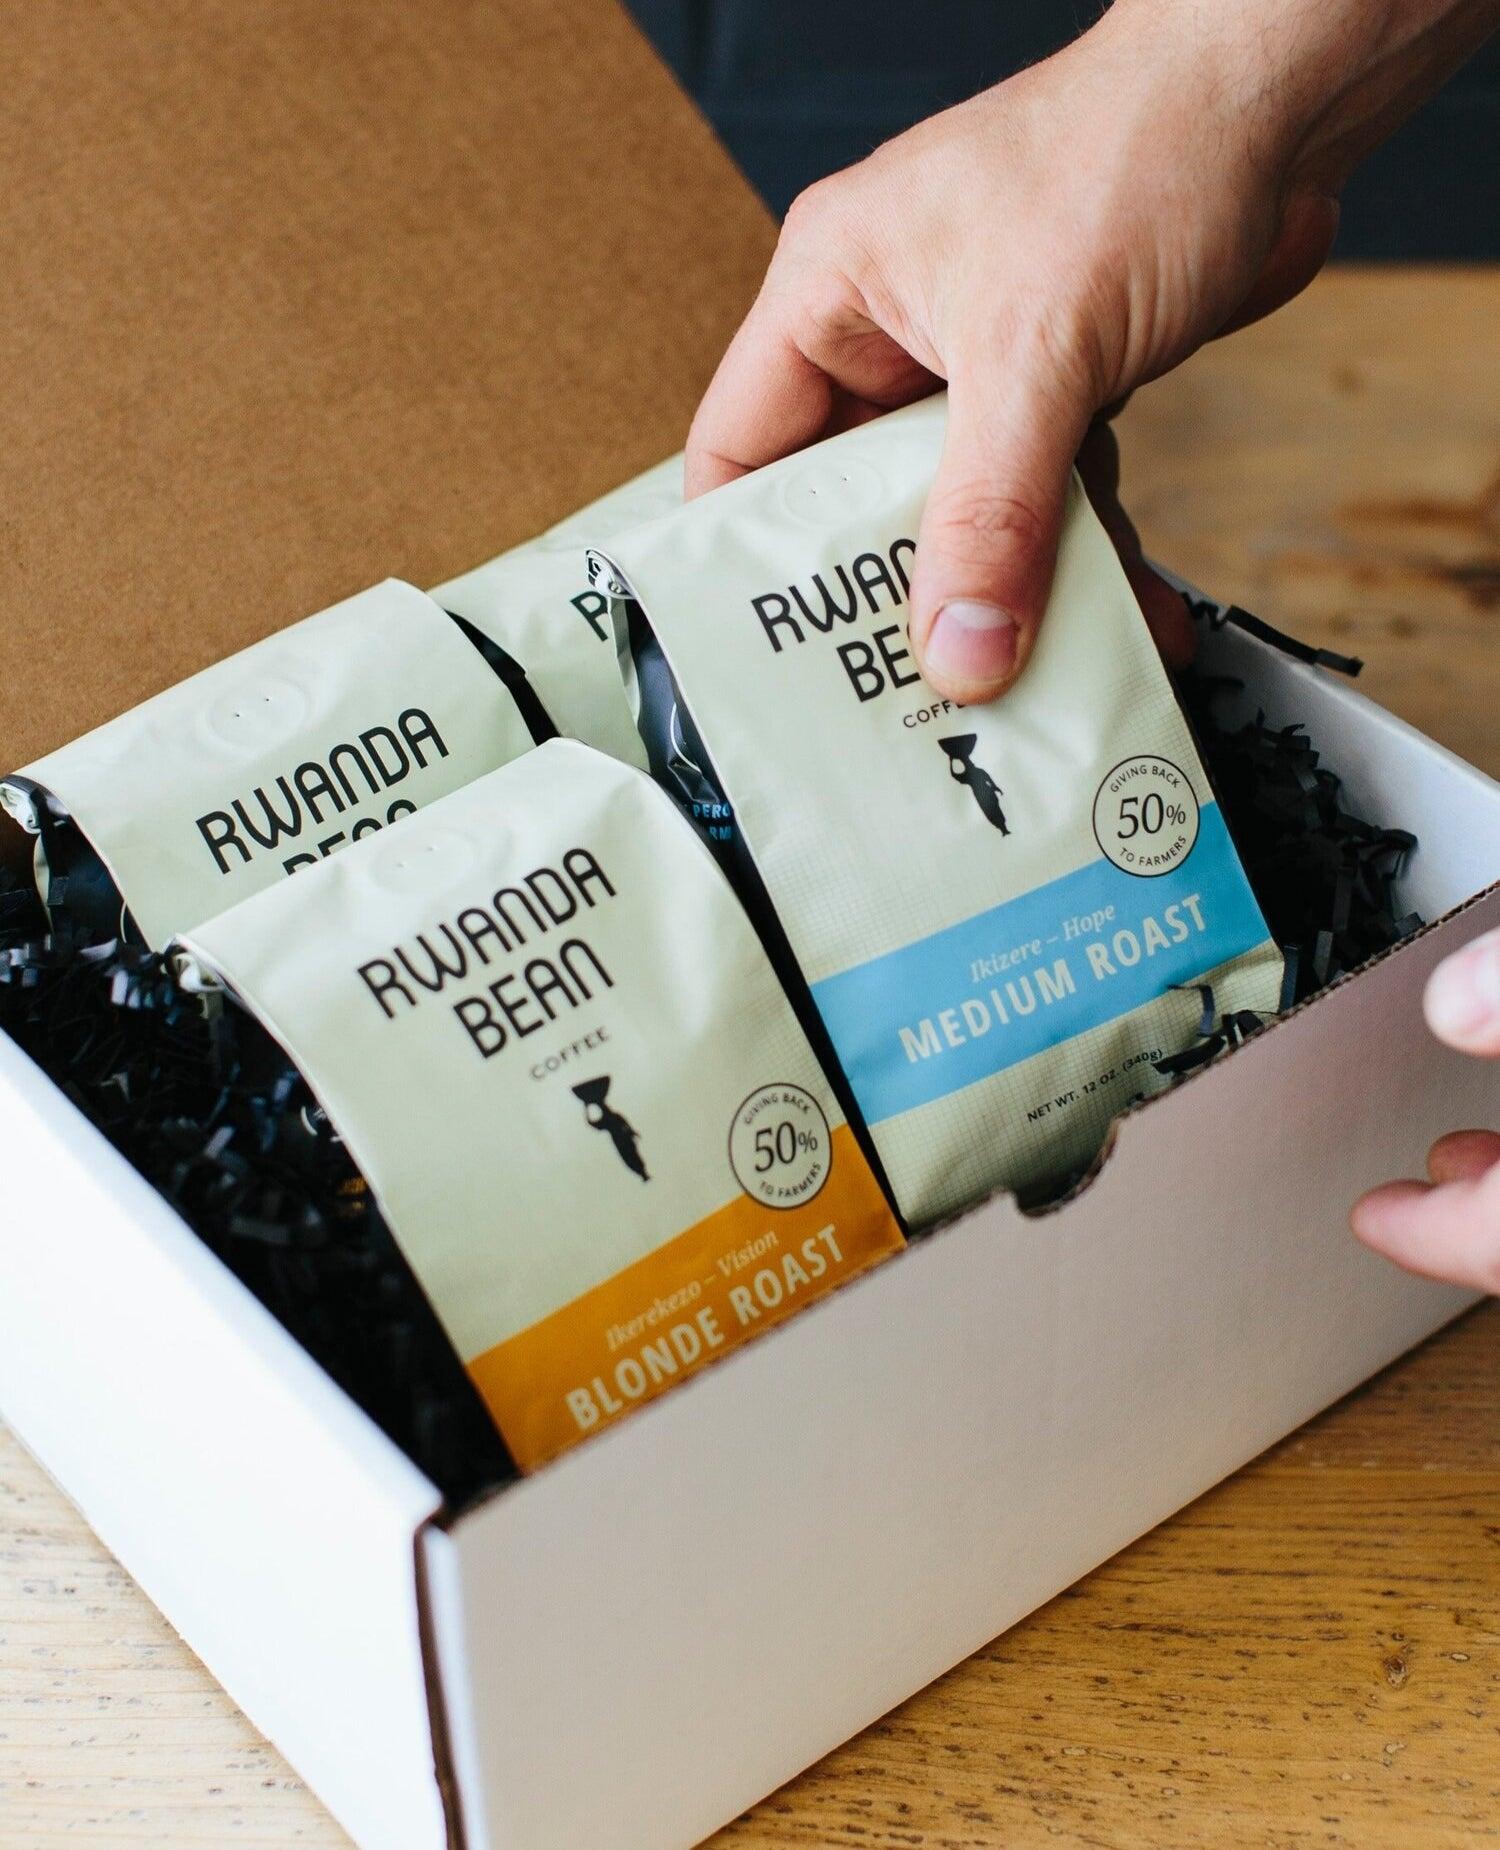 box full of four different bags of Rwanda bean coffee